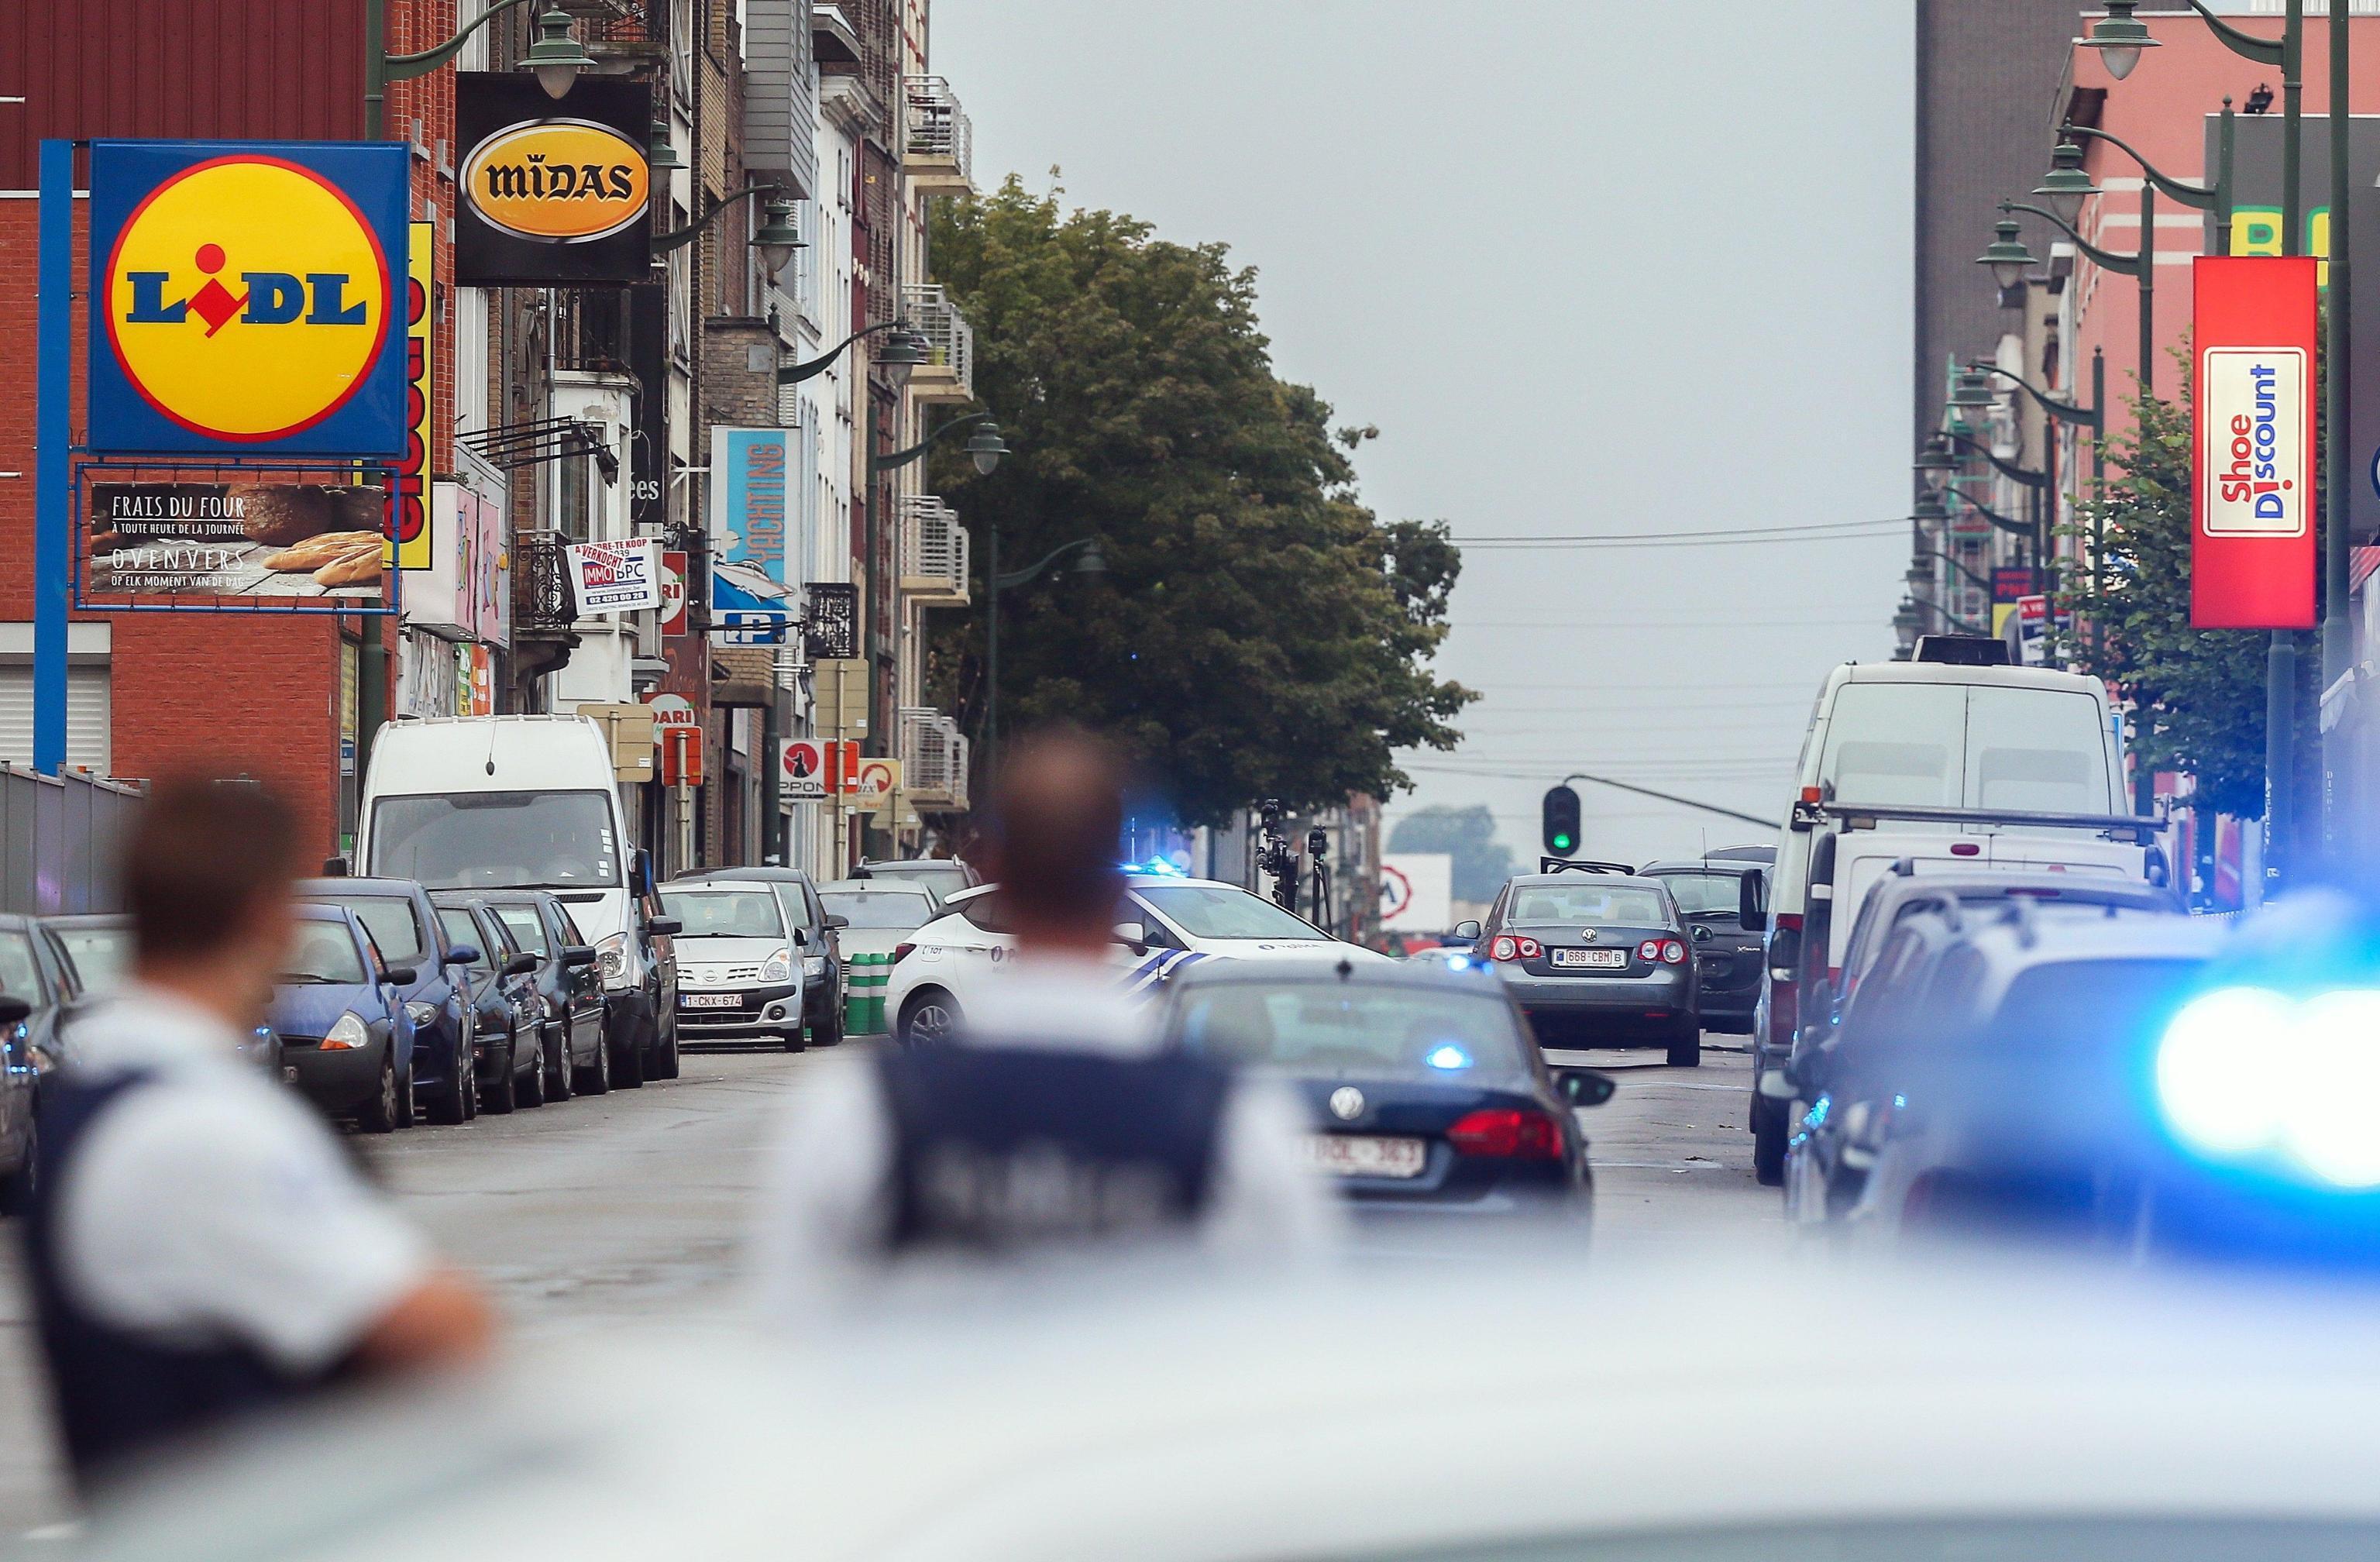 Paura a Molenbeek, polizia sul posto